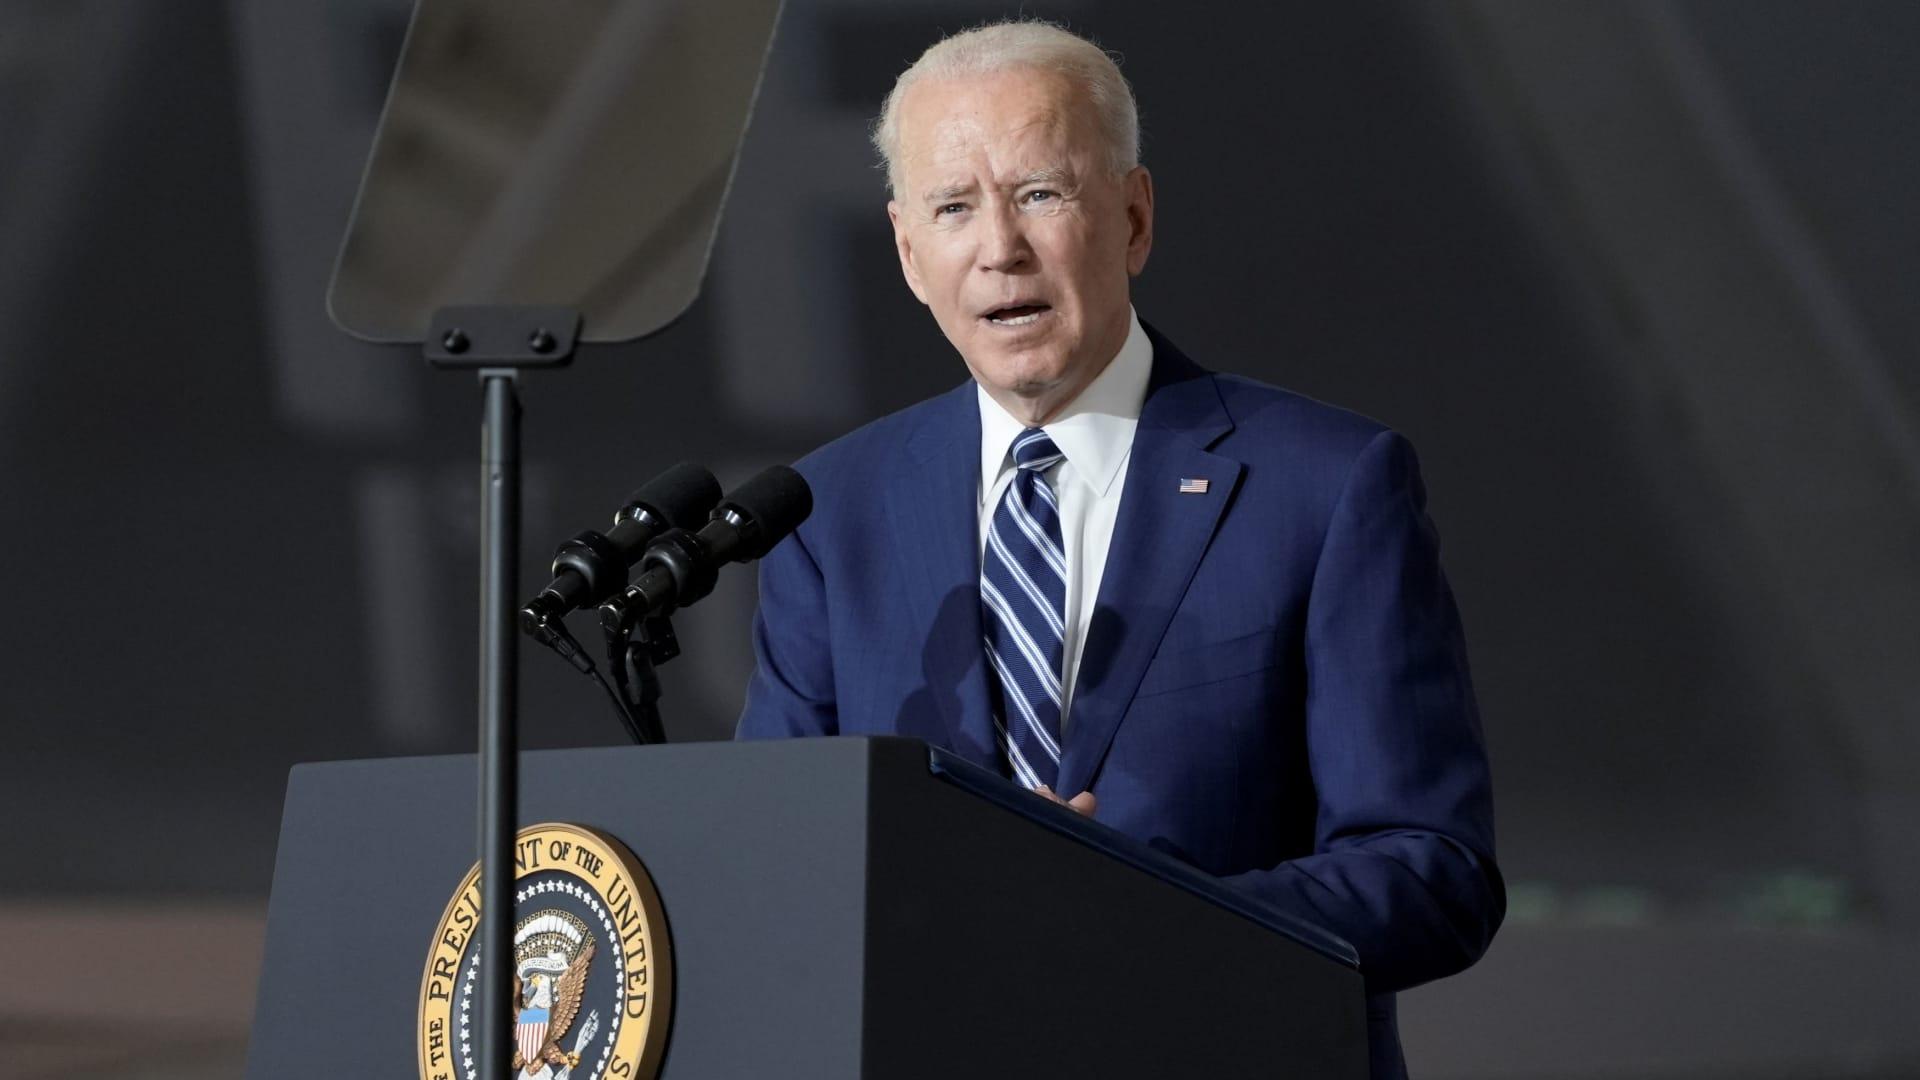 U.S. President Joe Biden speaks as he visits Joint Base Langley-Eustis with first lady Jill Biden, in Hampton, Virginia, May 28, 2021.